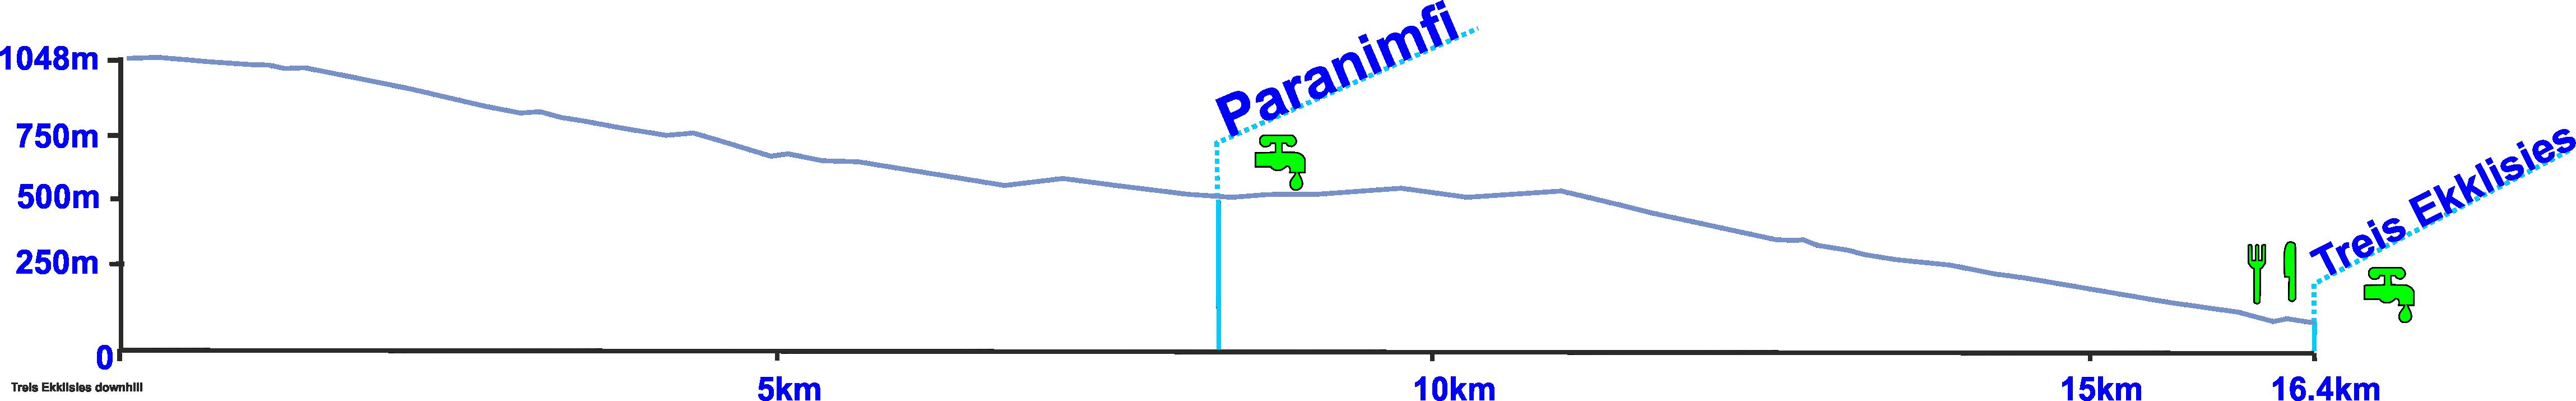 treis ekklisies elevation profile